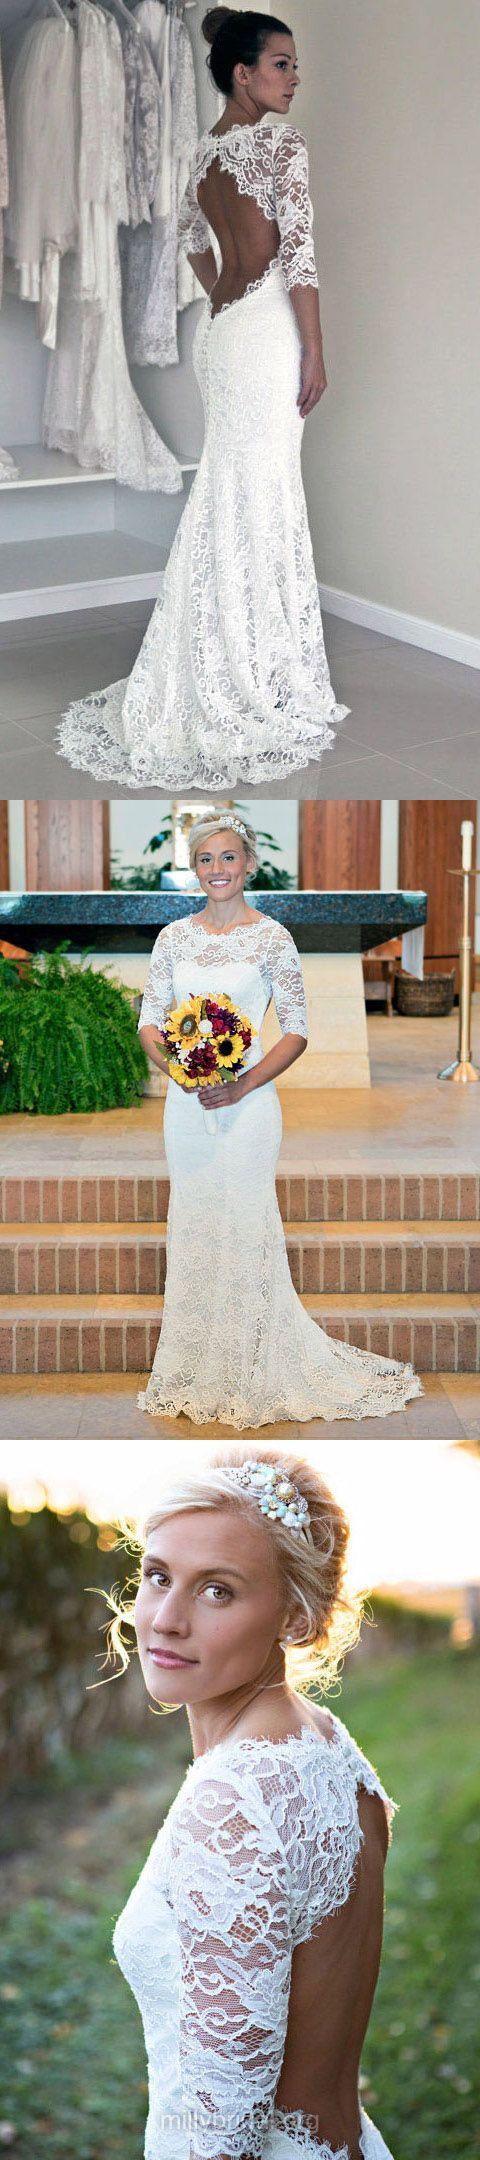 best events ideas dresses images on pinterest short prom